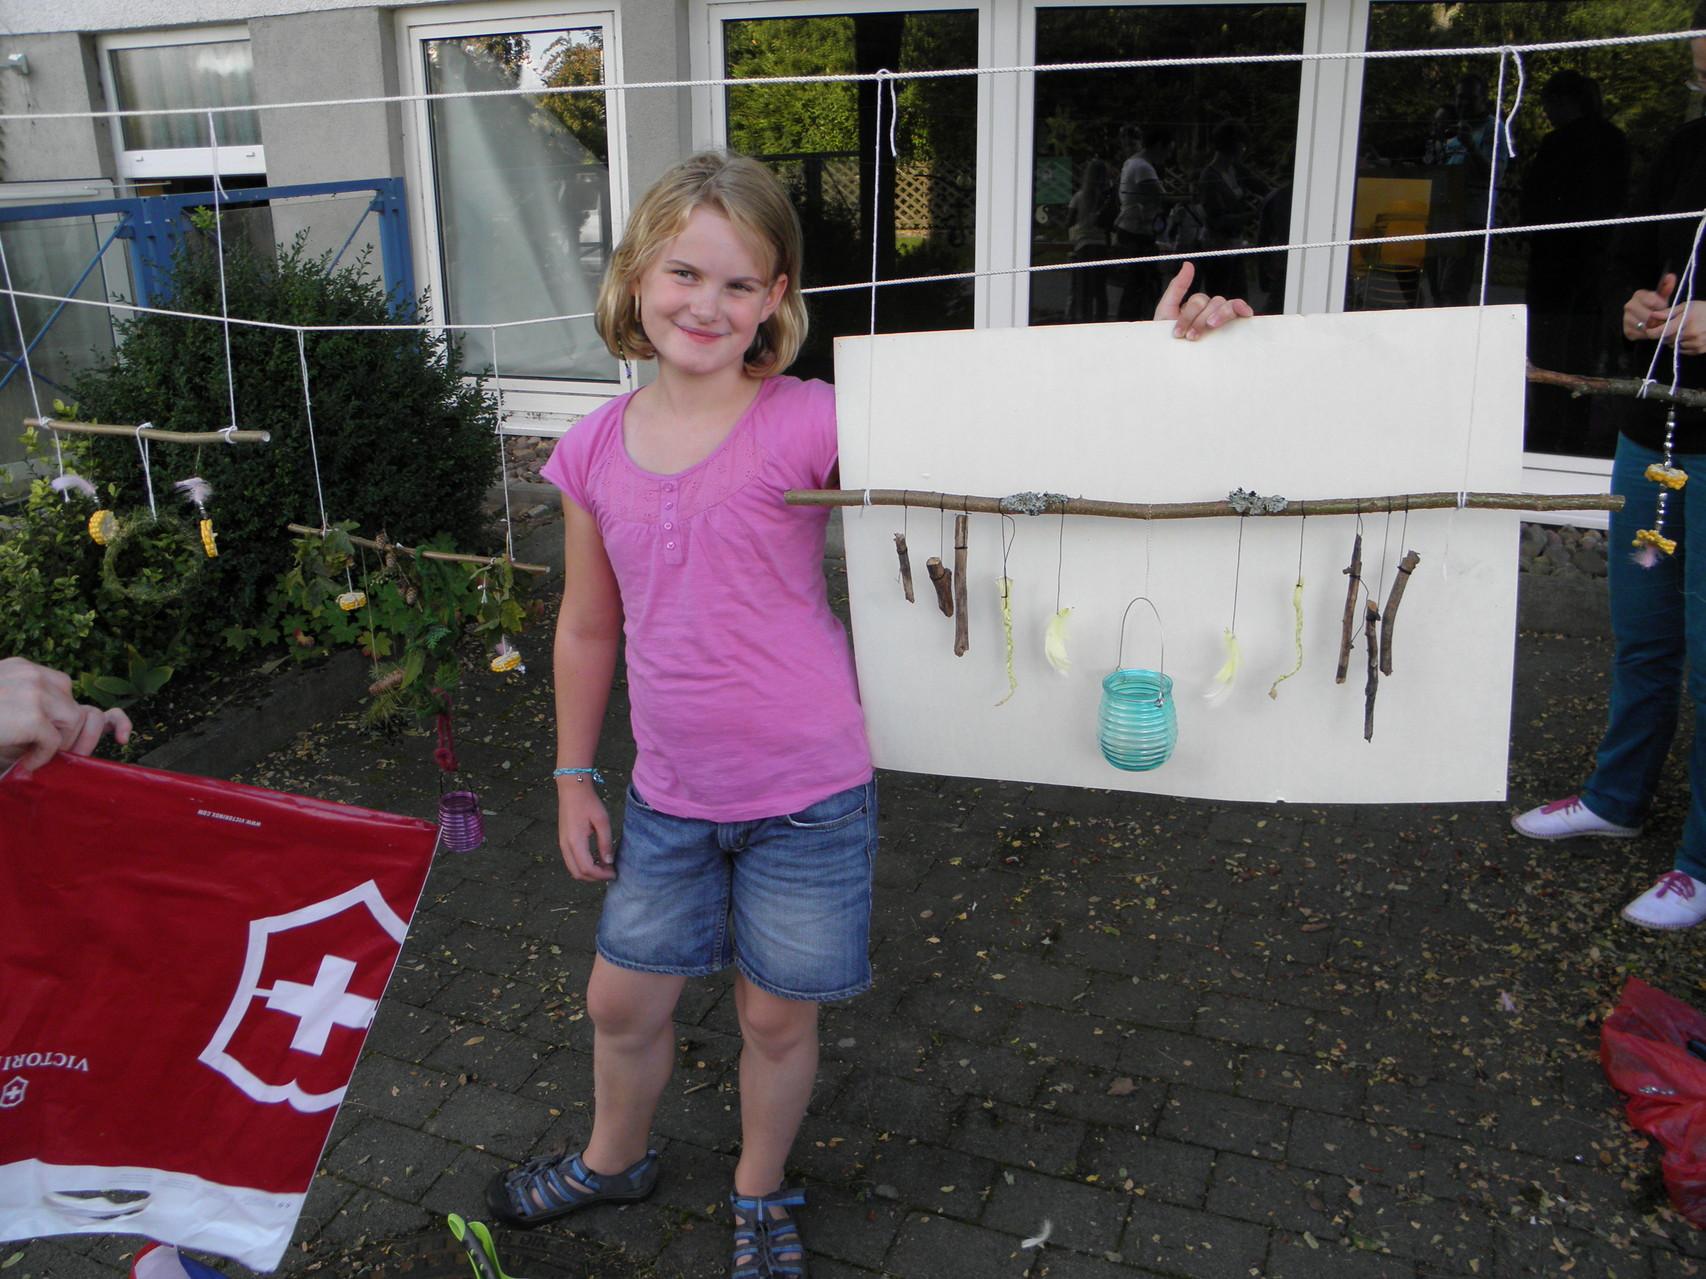 Ferienspiele 2014 - die kreative Naturwerkstatt: fertige Kunstwerke!